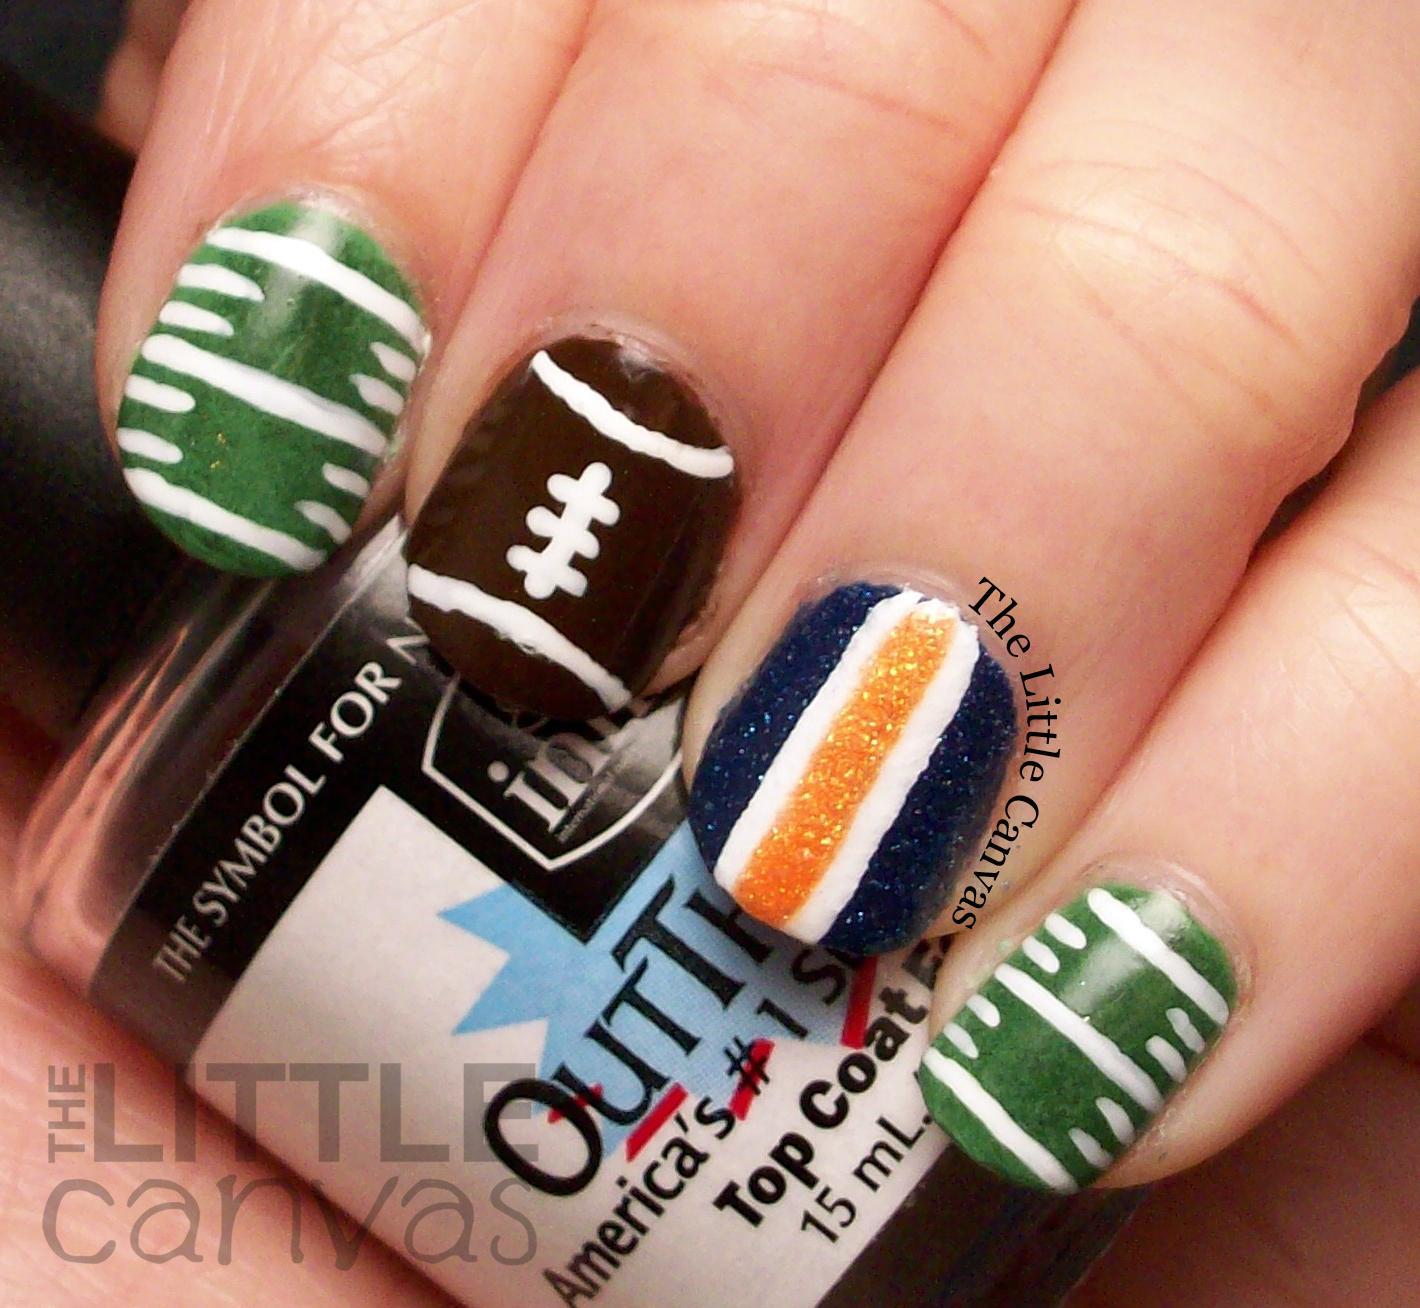 A Zoya Superbowl Manicure - Go Broncos! - The Little Canvas